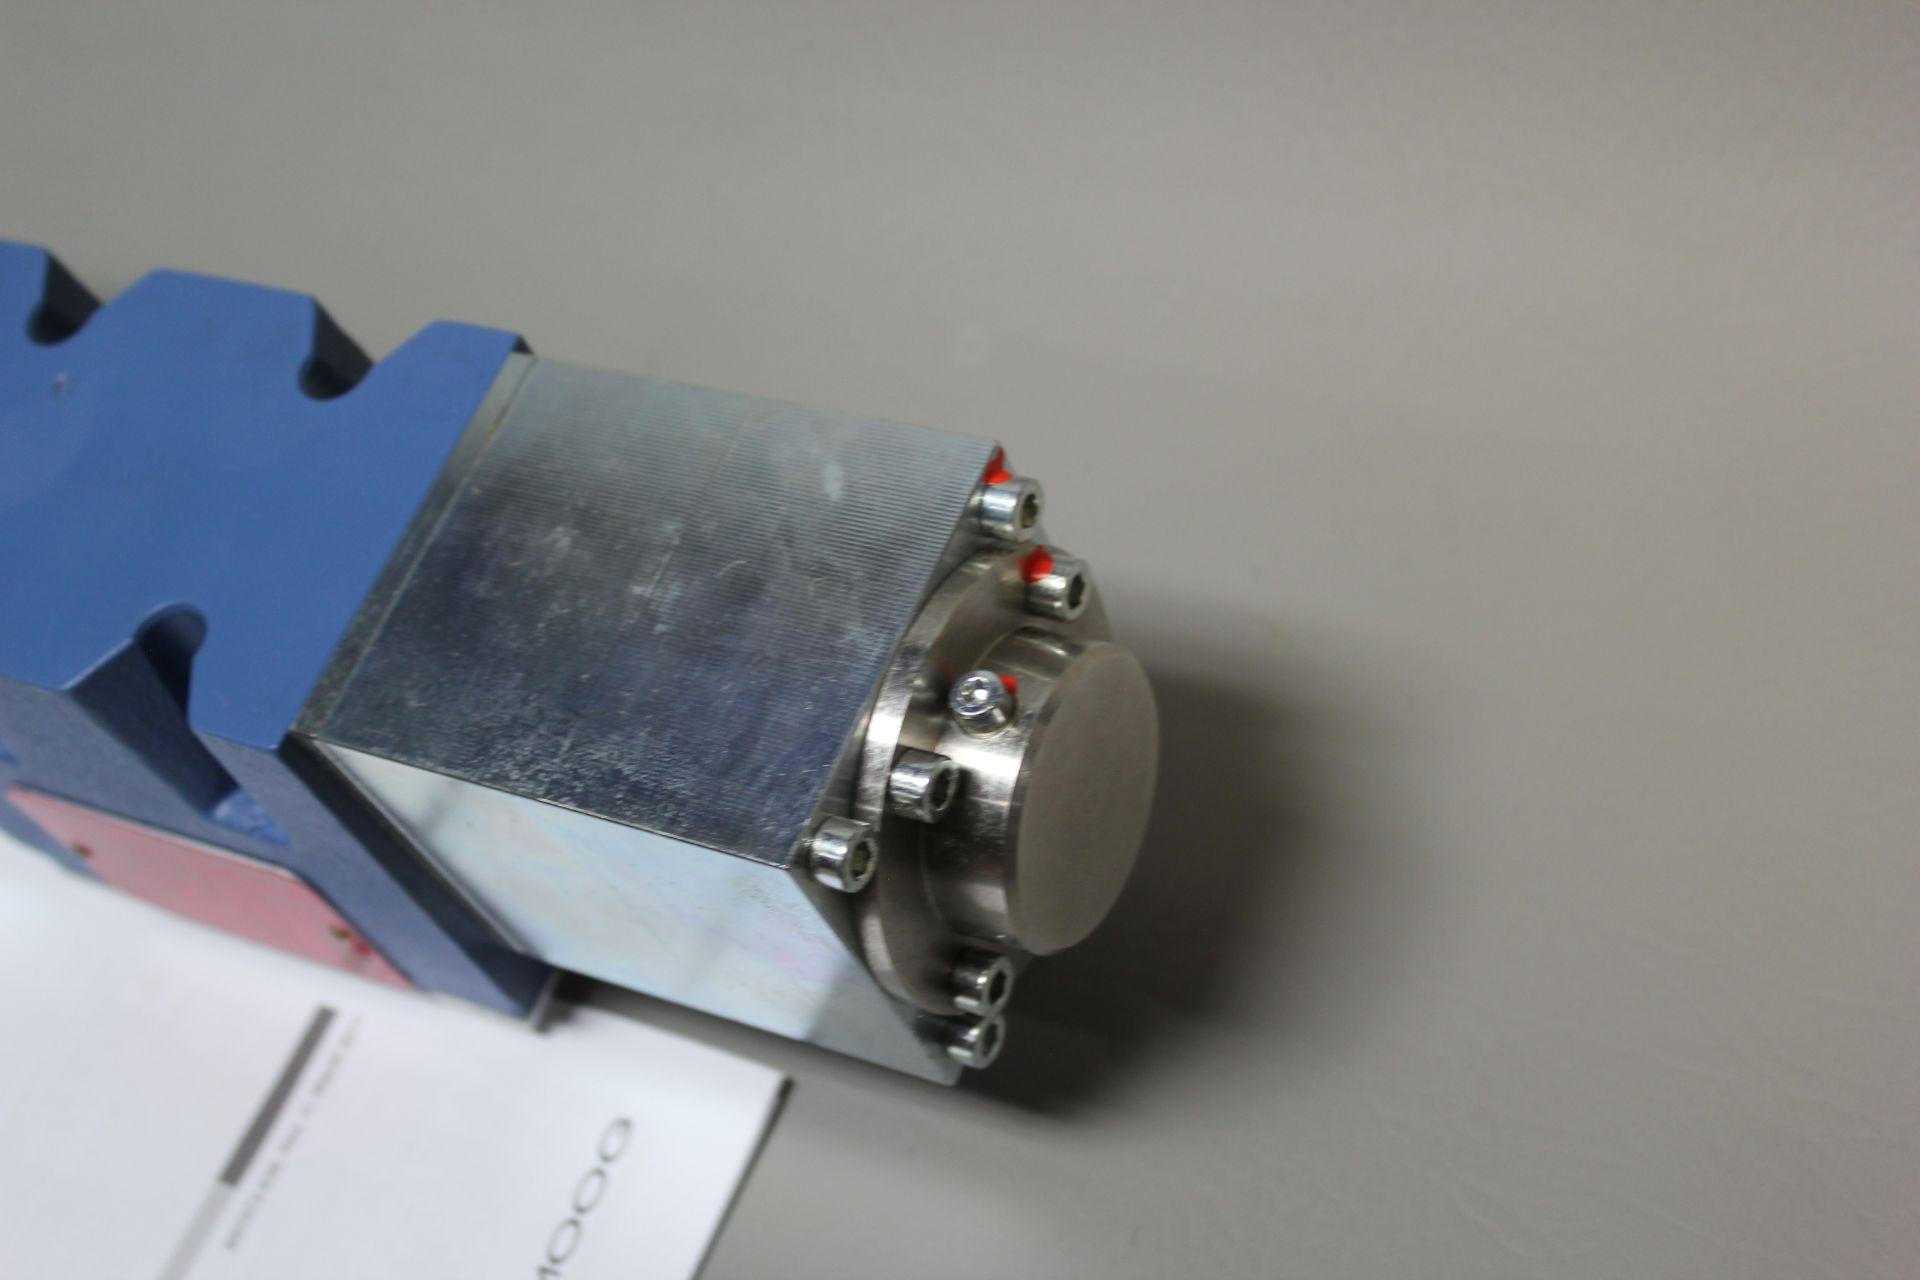 NEW MOOG DIRECT DRIVE DIGITAL CONTROL HYDRAULIC SERVO VALVE - Image 8 of 14